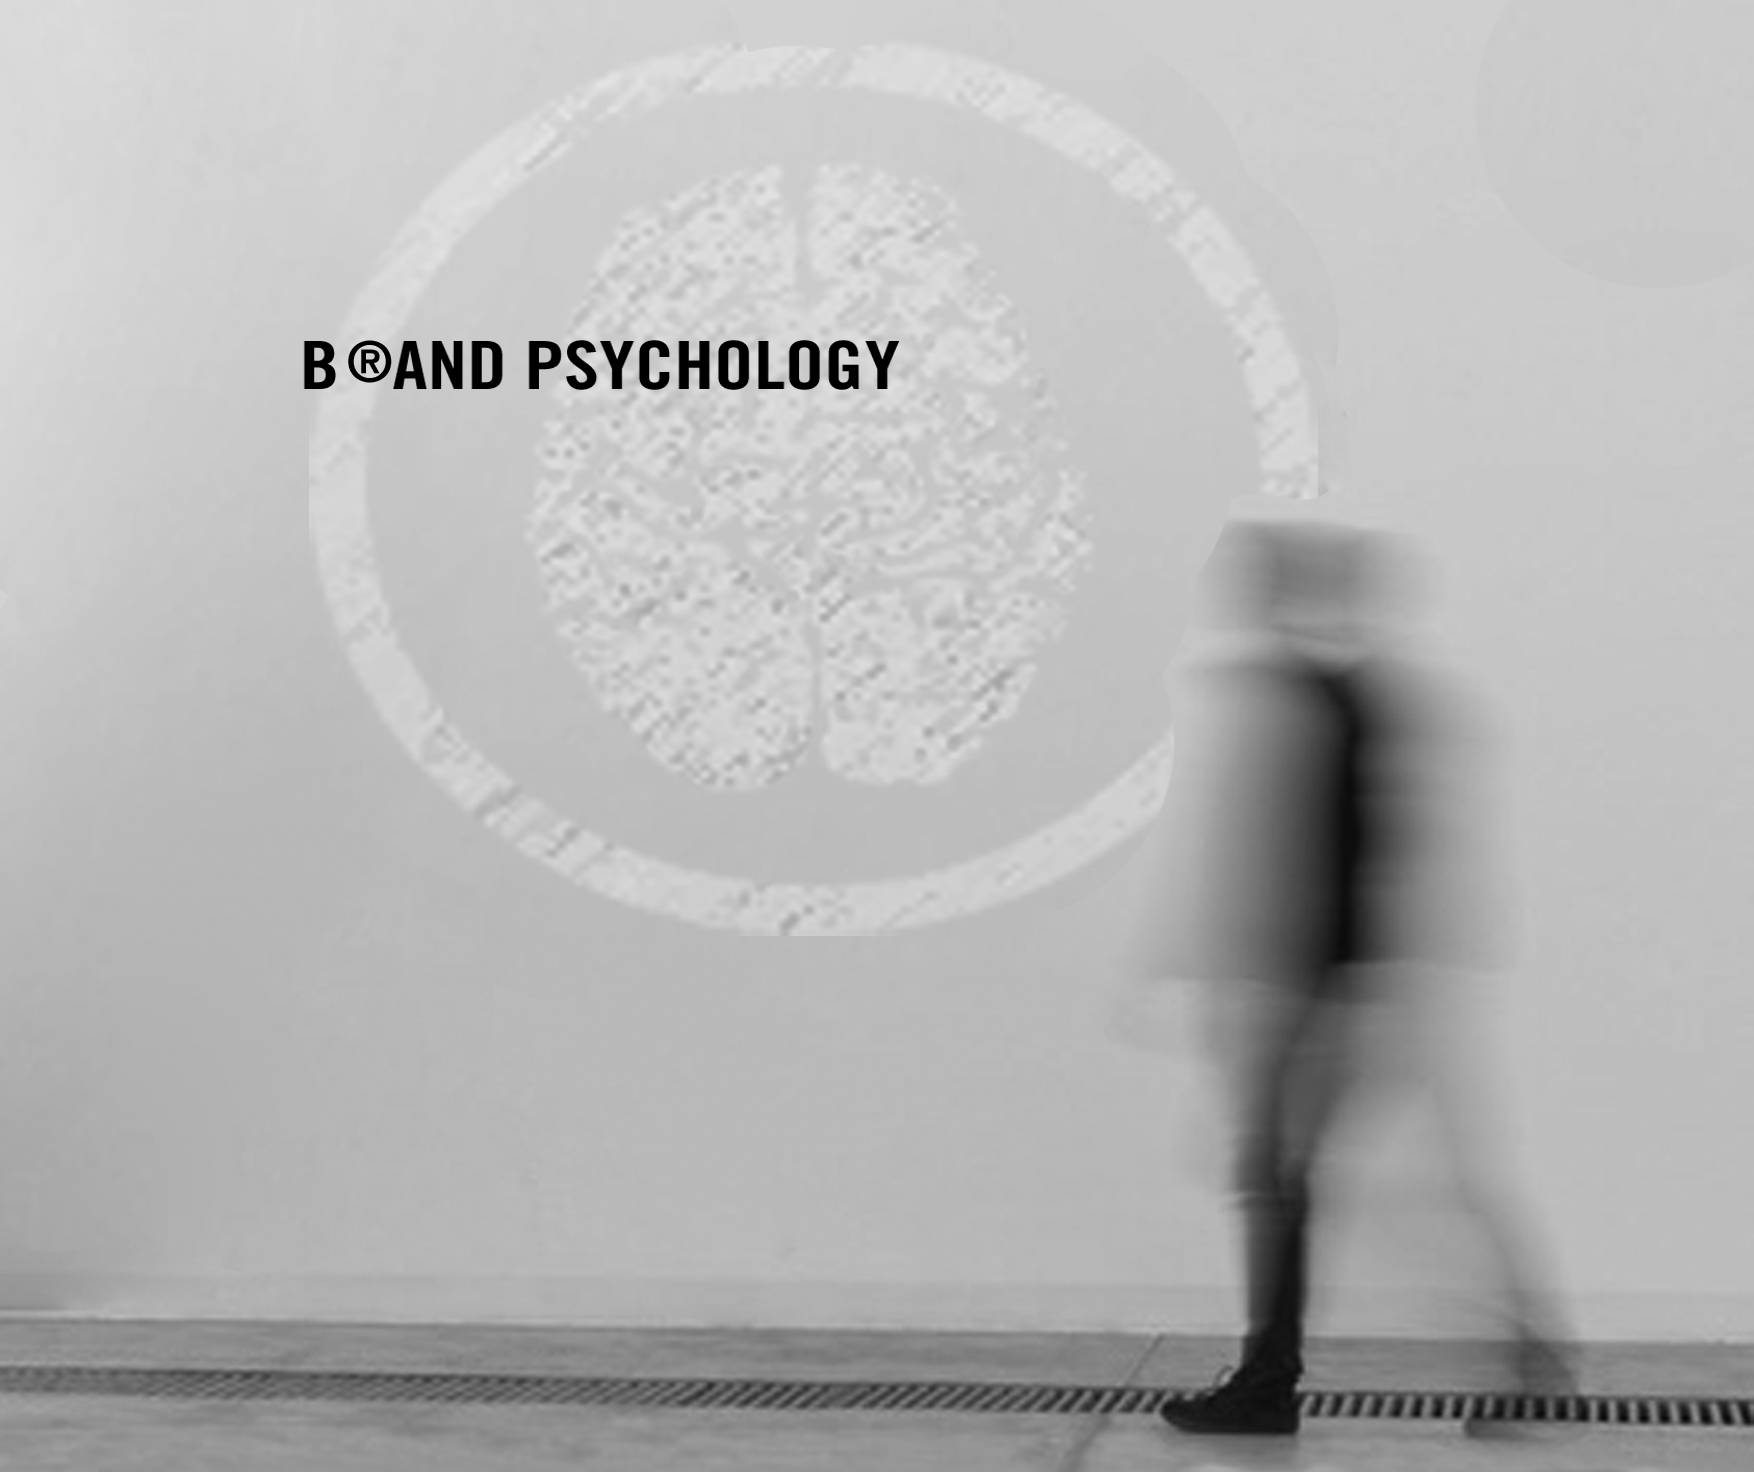 wall brand psychology.jpg